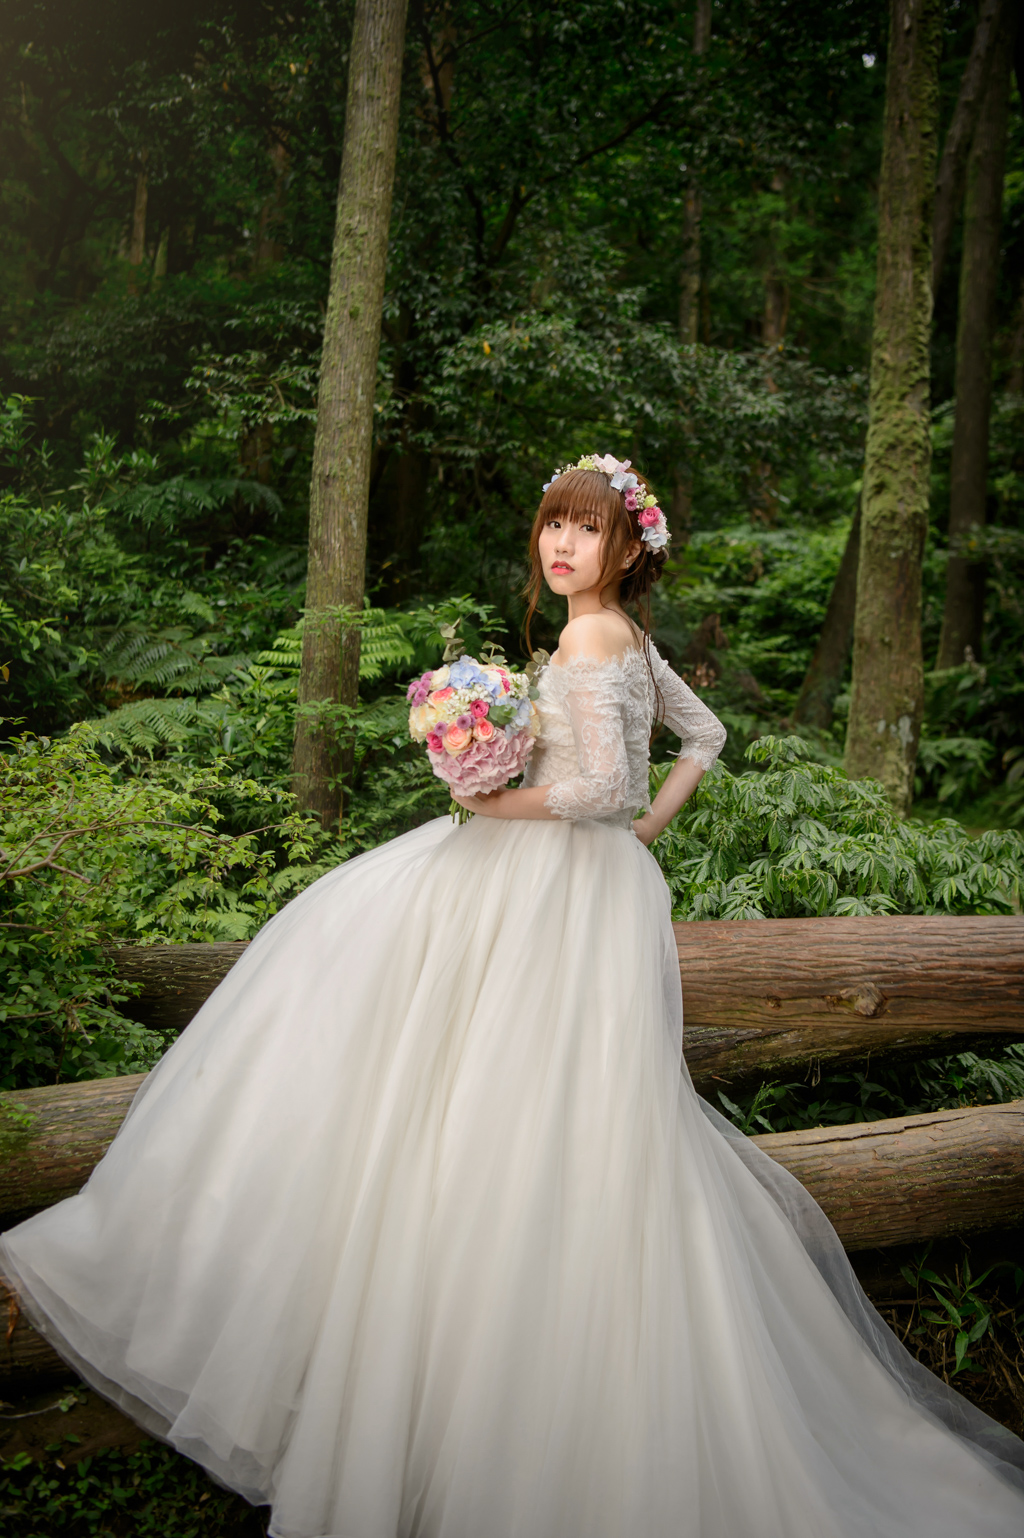 婚攝小勇, 小寶團隊, 自助婚紗, niniko, wedding day-003